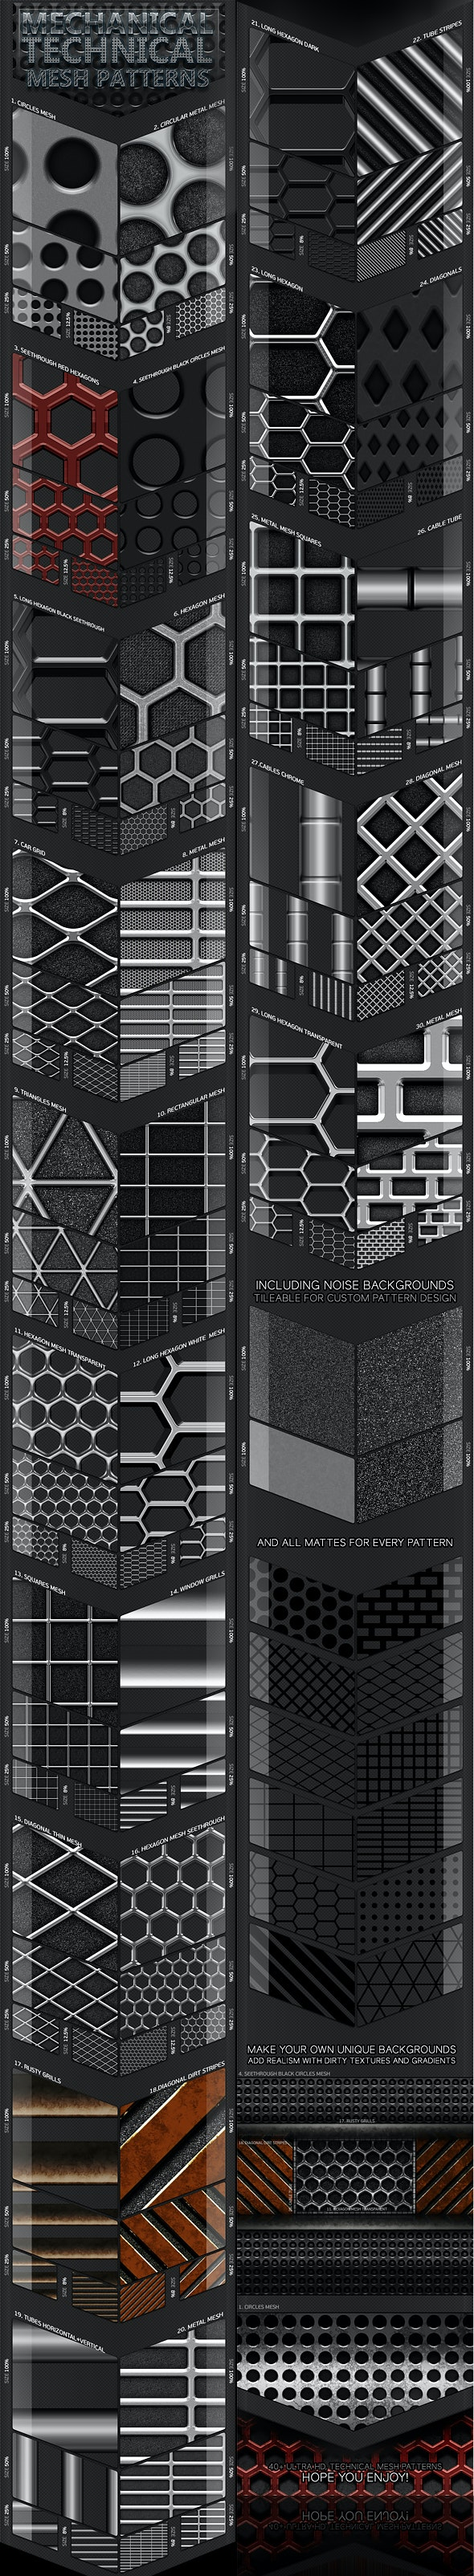 45 Mechanical Technical Mesh Patterns - Miscellaneous Textures / Fills / Patterns